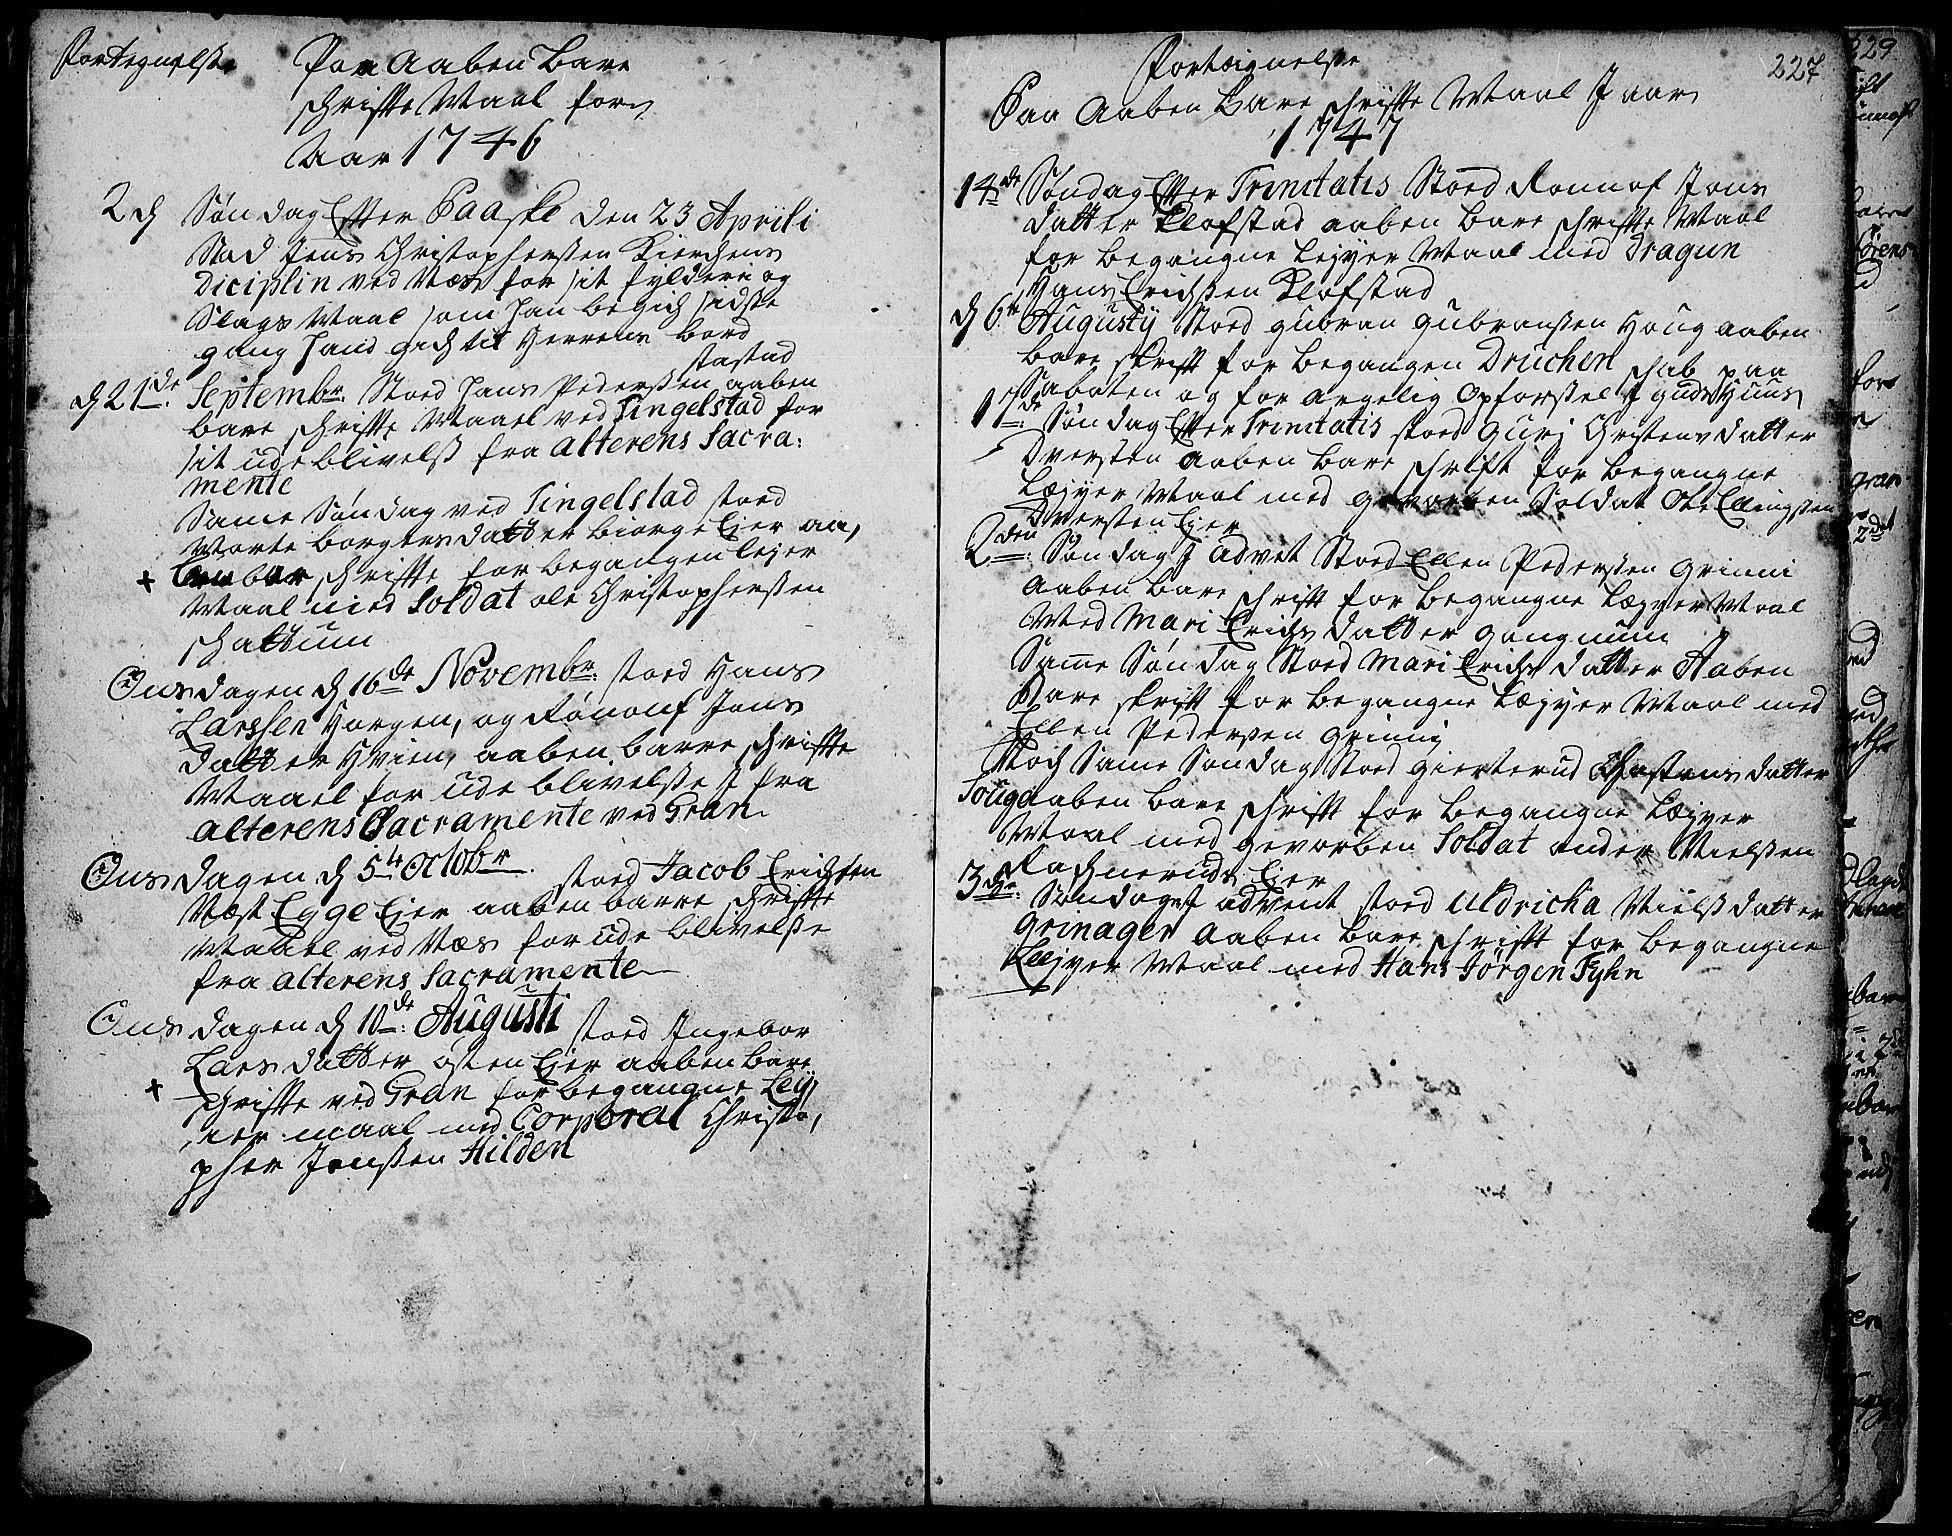 SAH, Gran prestekontor, Ministerialbok nr. 3, 1745-1758, s. 227